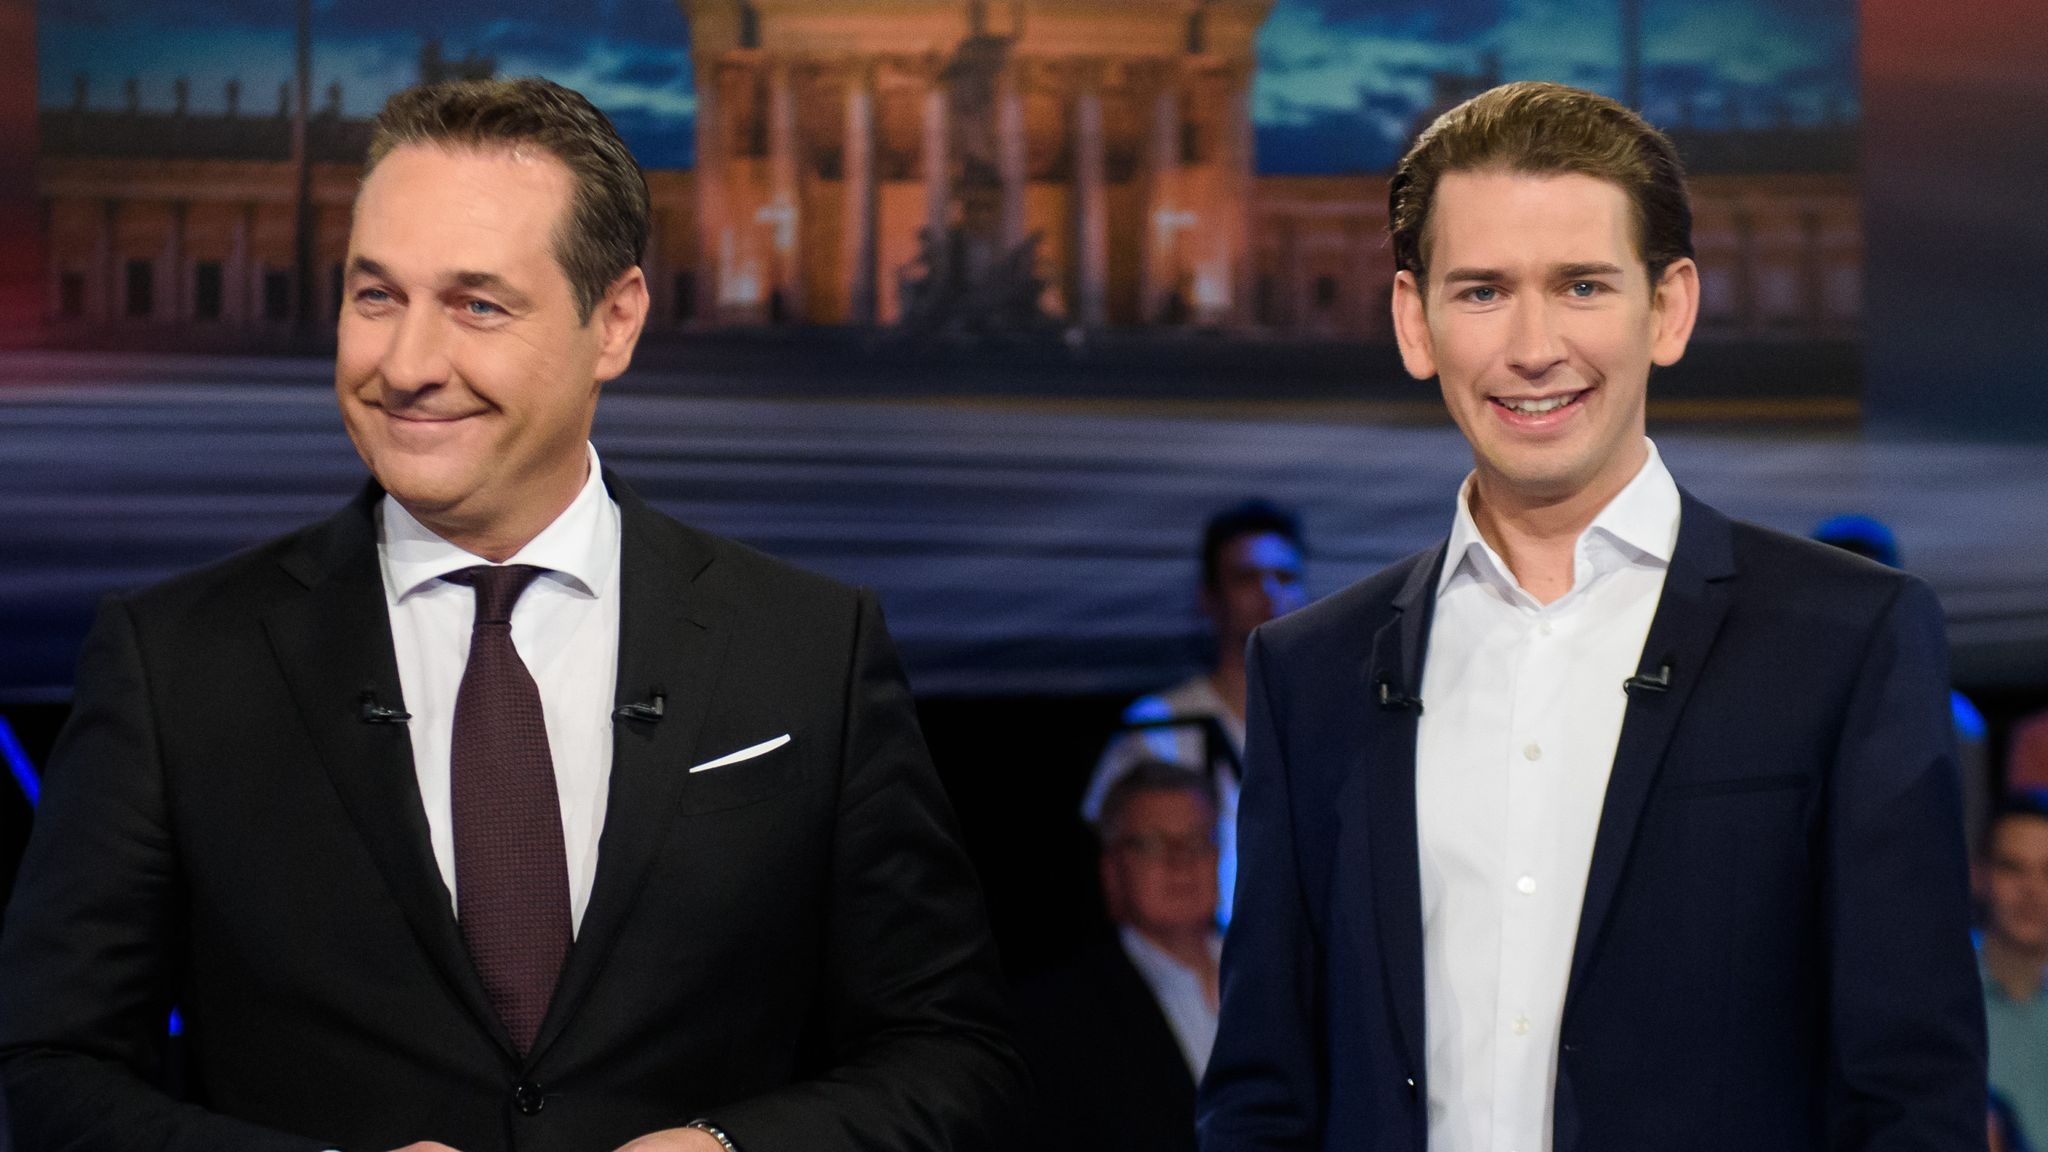 Austrian conservative leader Kurz to launch coalition